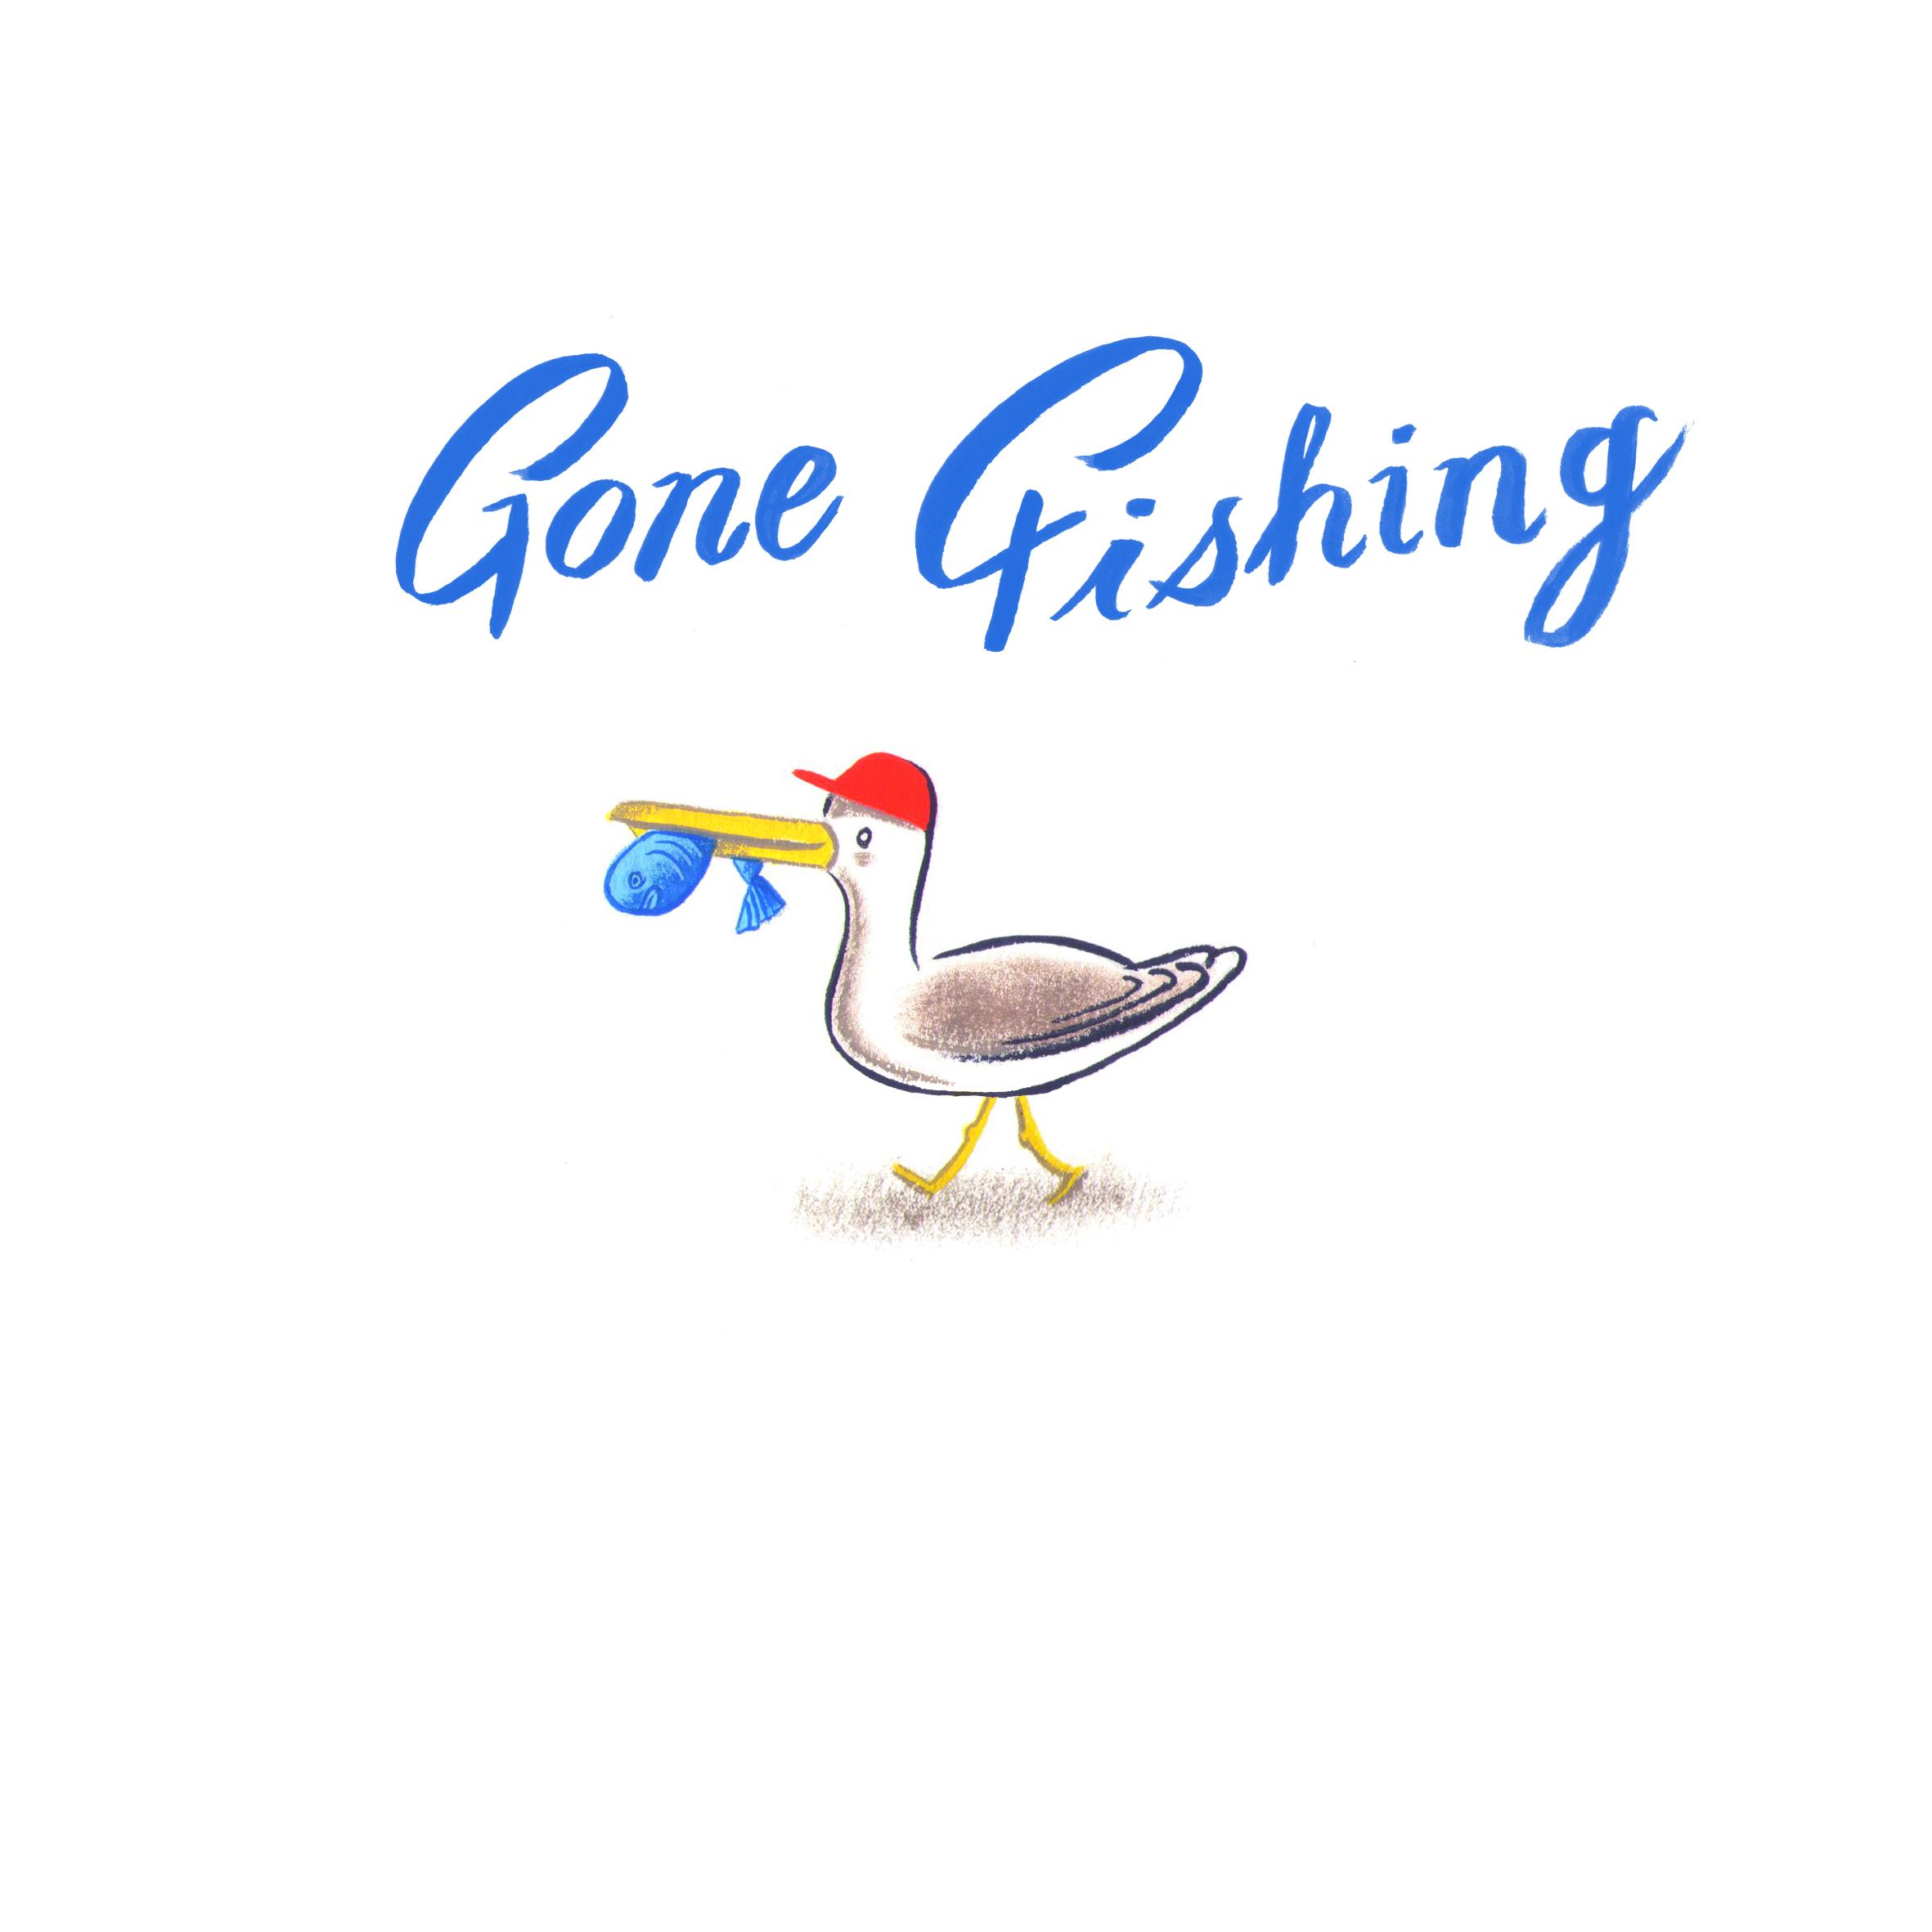 gone-fishing-text.jpg